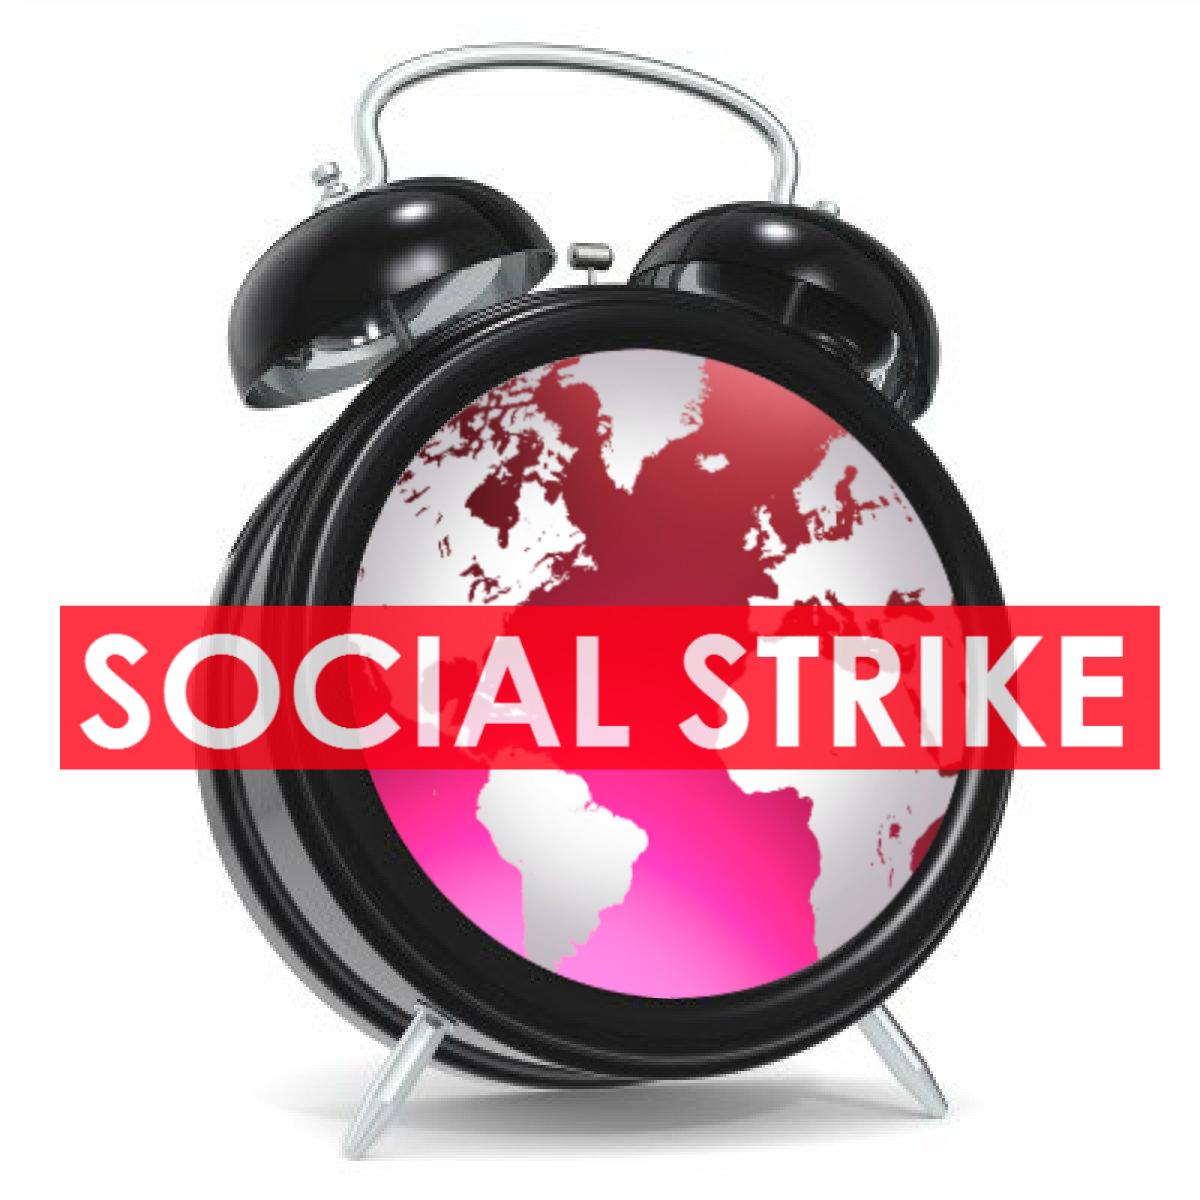 socialstrikelogo1-1